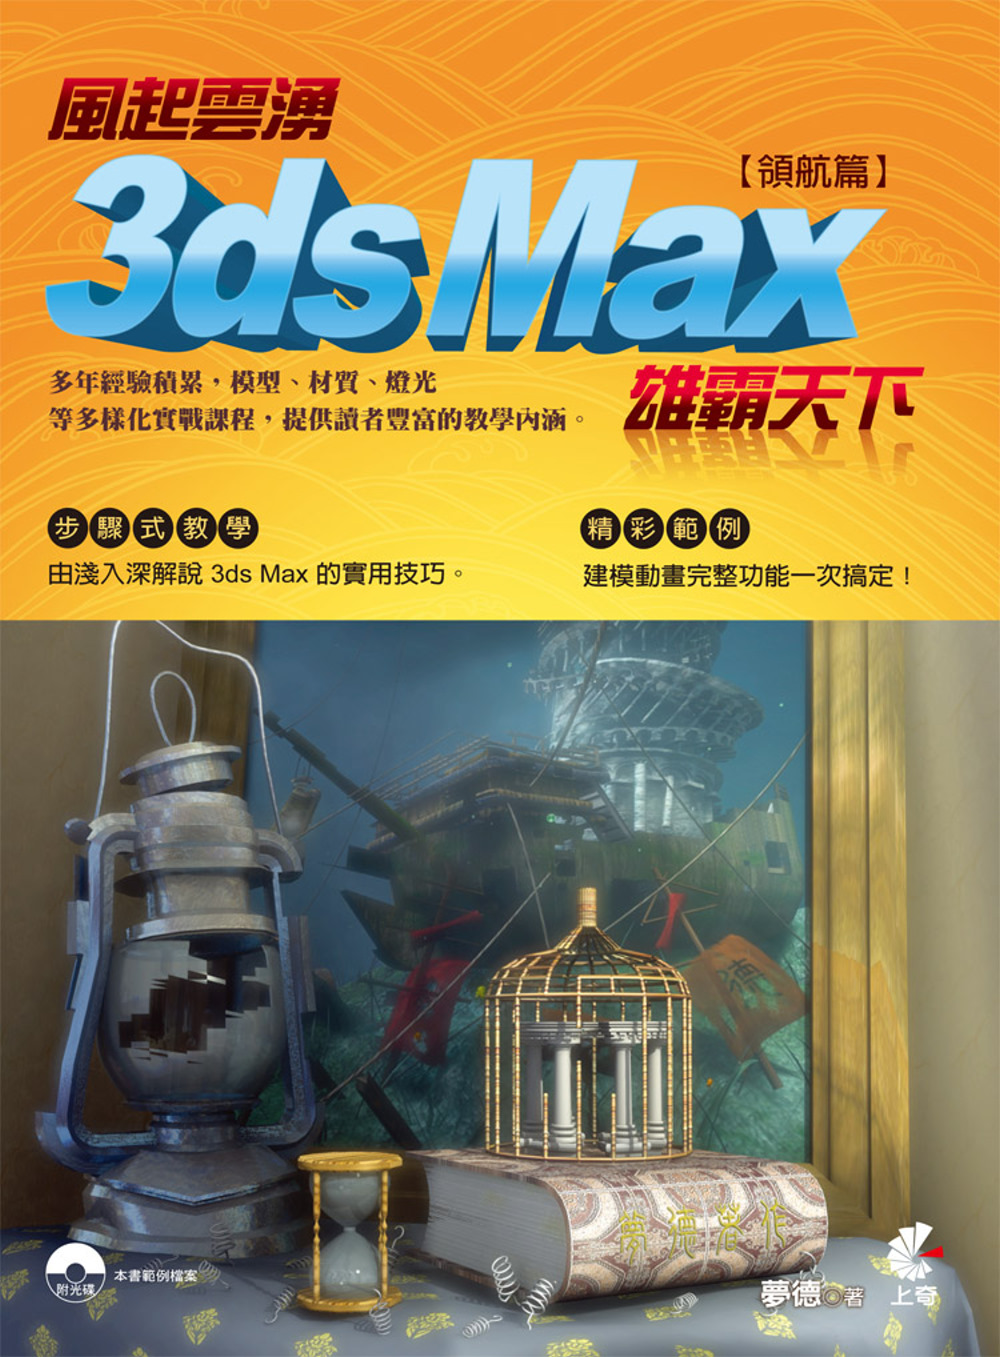 風起雲湧:3ds Max 雄霸天下(...